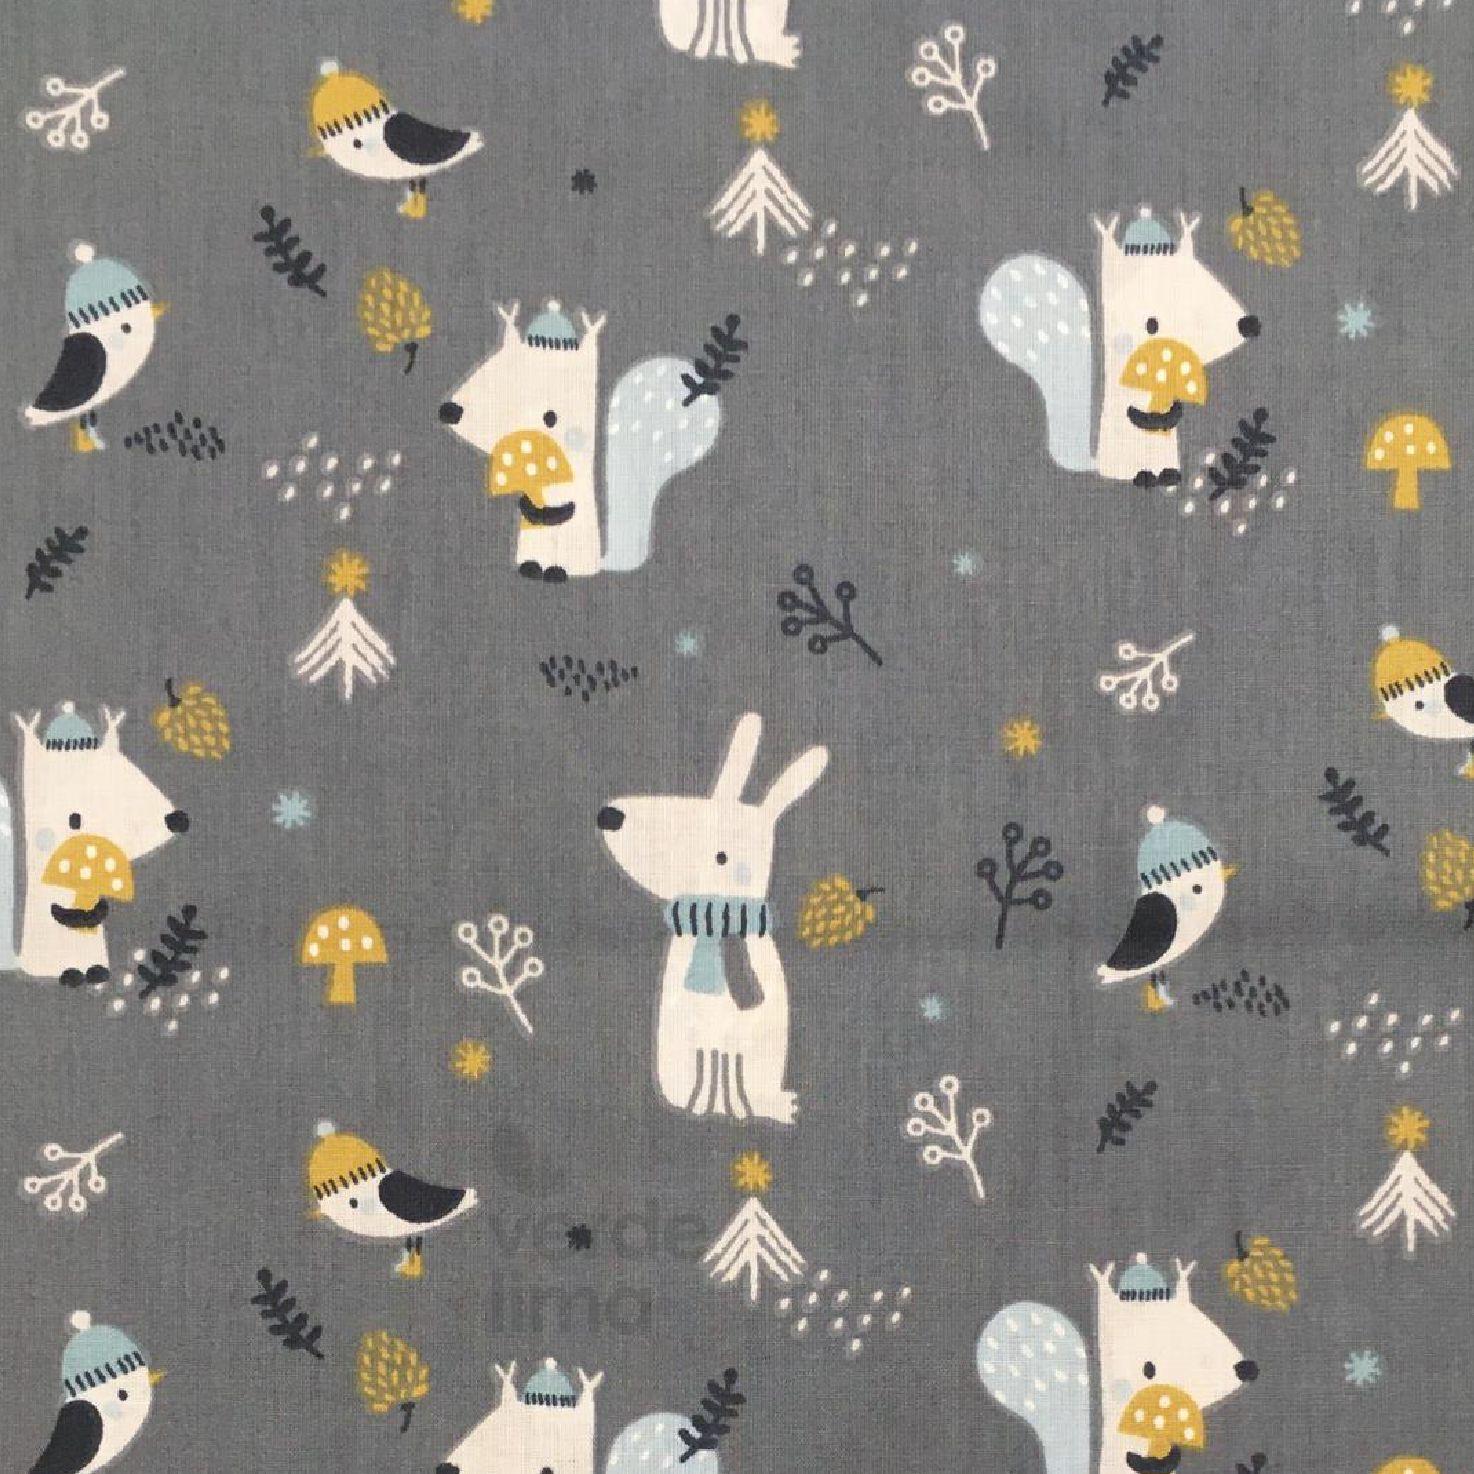 Winter fox - Squirrel and bird